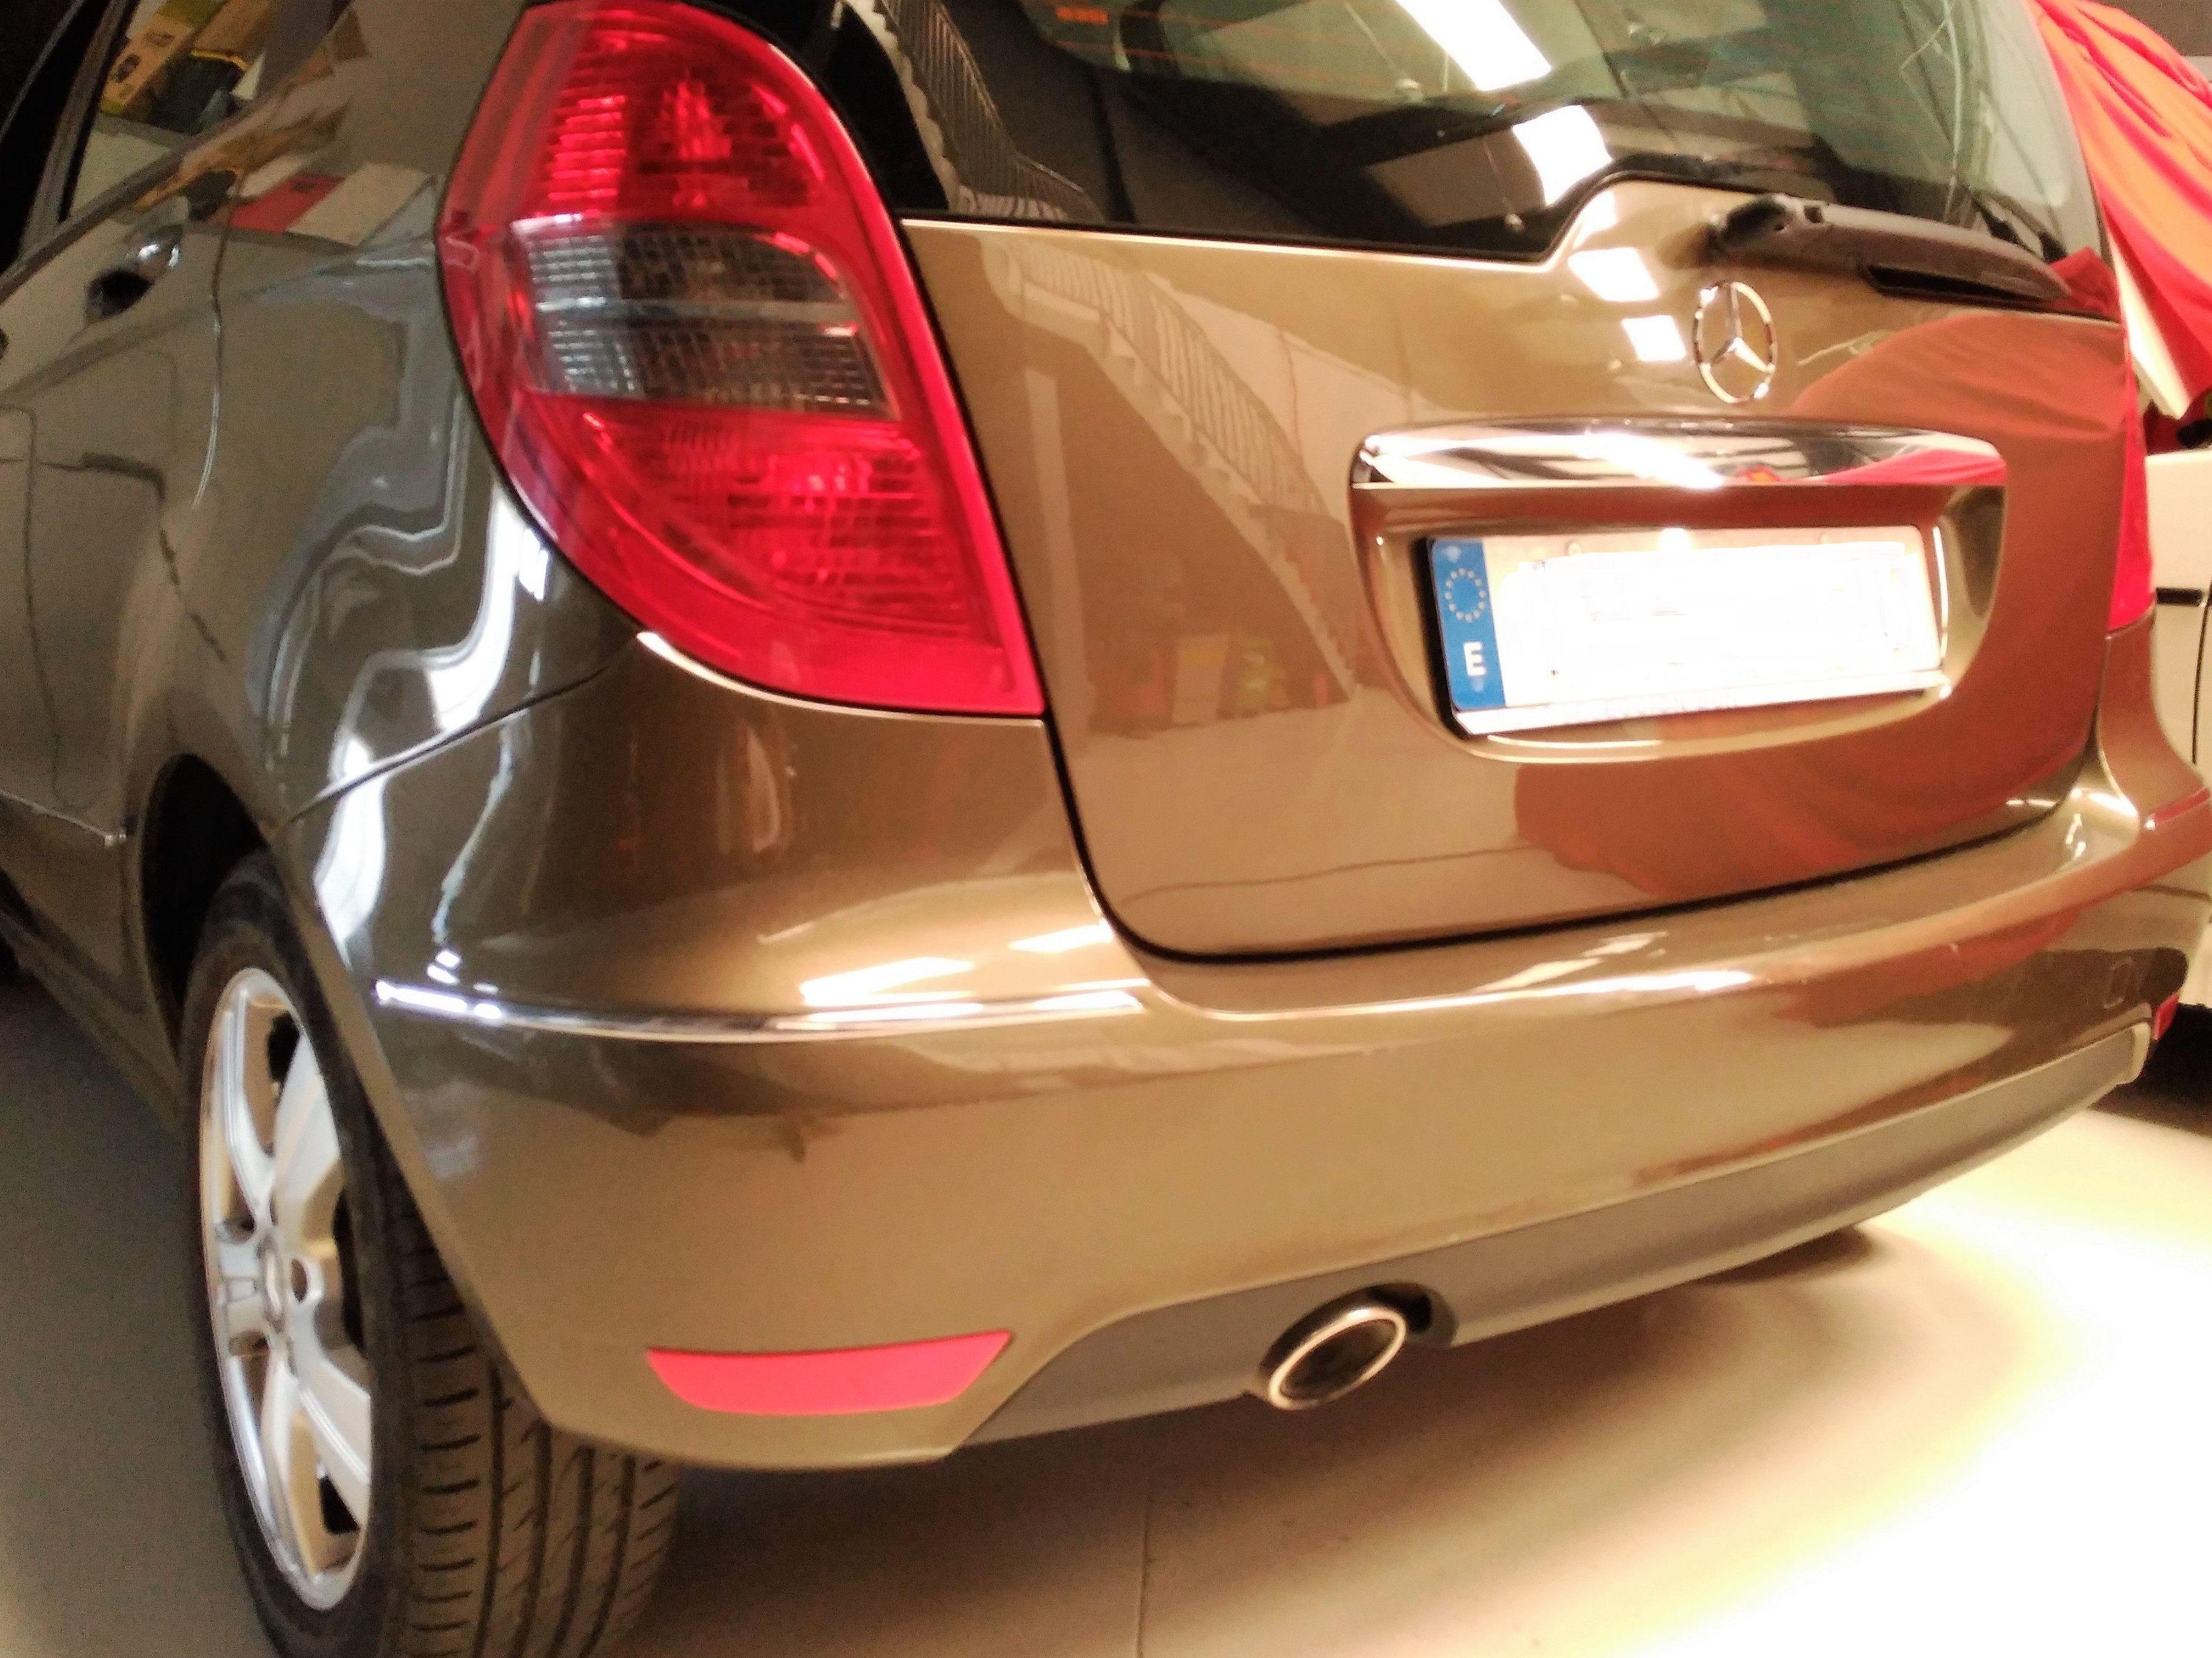 Foto 17 de Talleres de automóviles en Vilafranca del Penedès | Garatge Veyrone G3